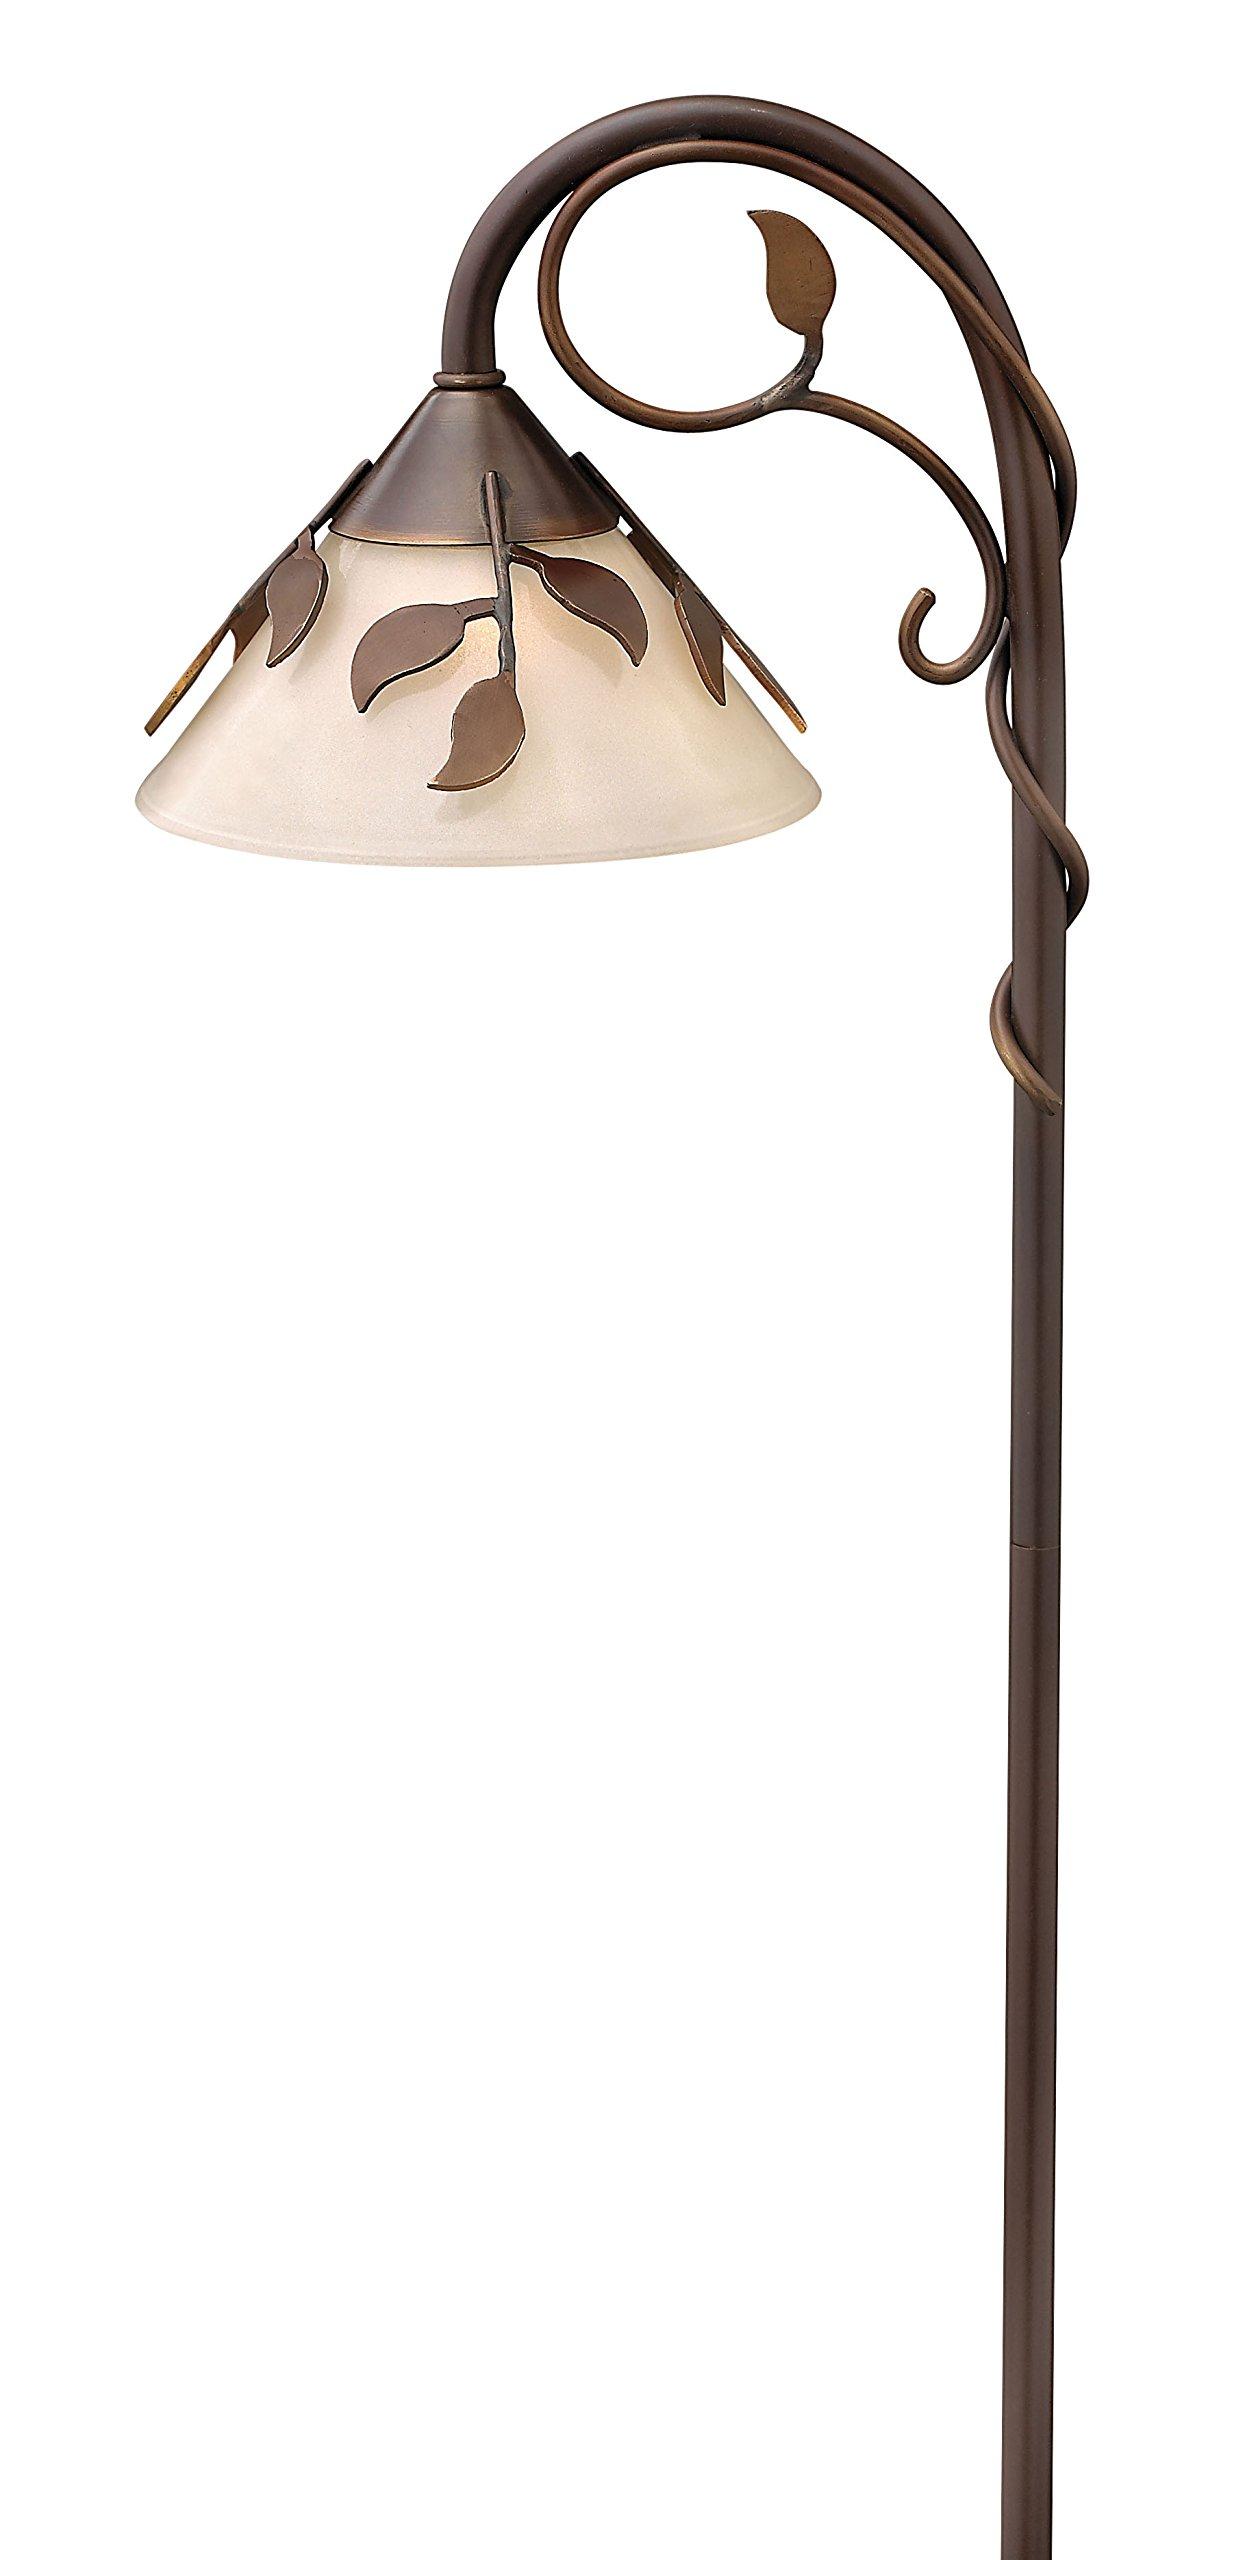 Hinkley Lighting 1508CB Solid Brass Ivy Path Light, 18 Watt T5 Wedge Base Light Bulb, Copper Bronze